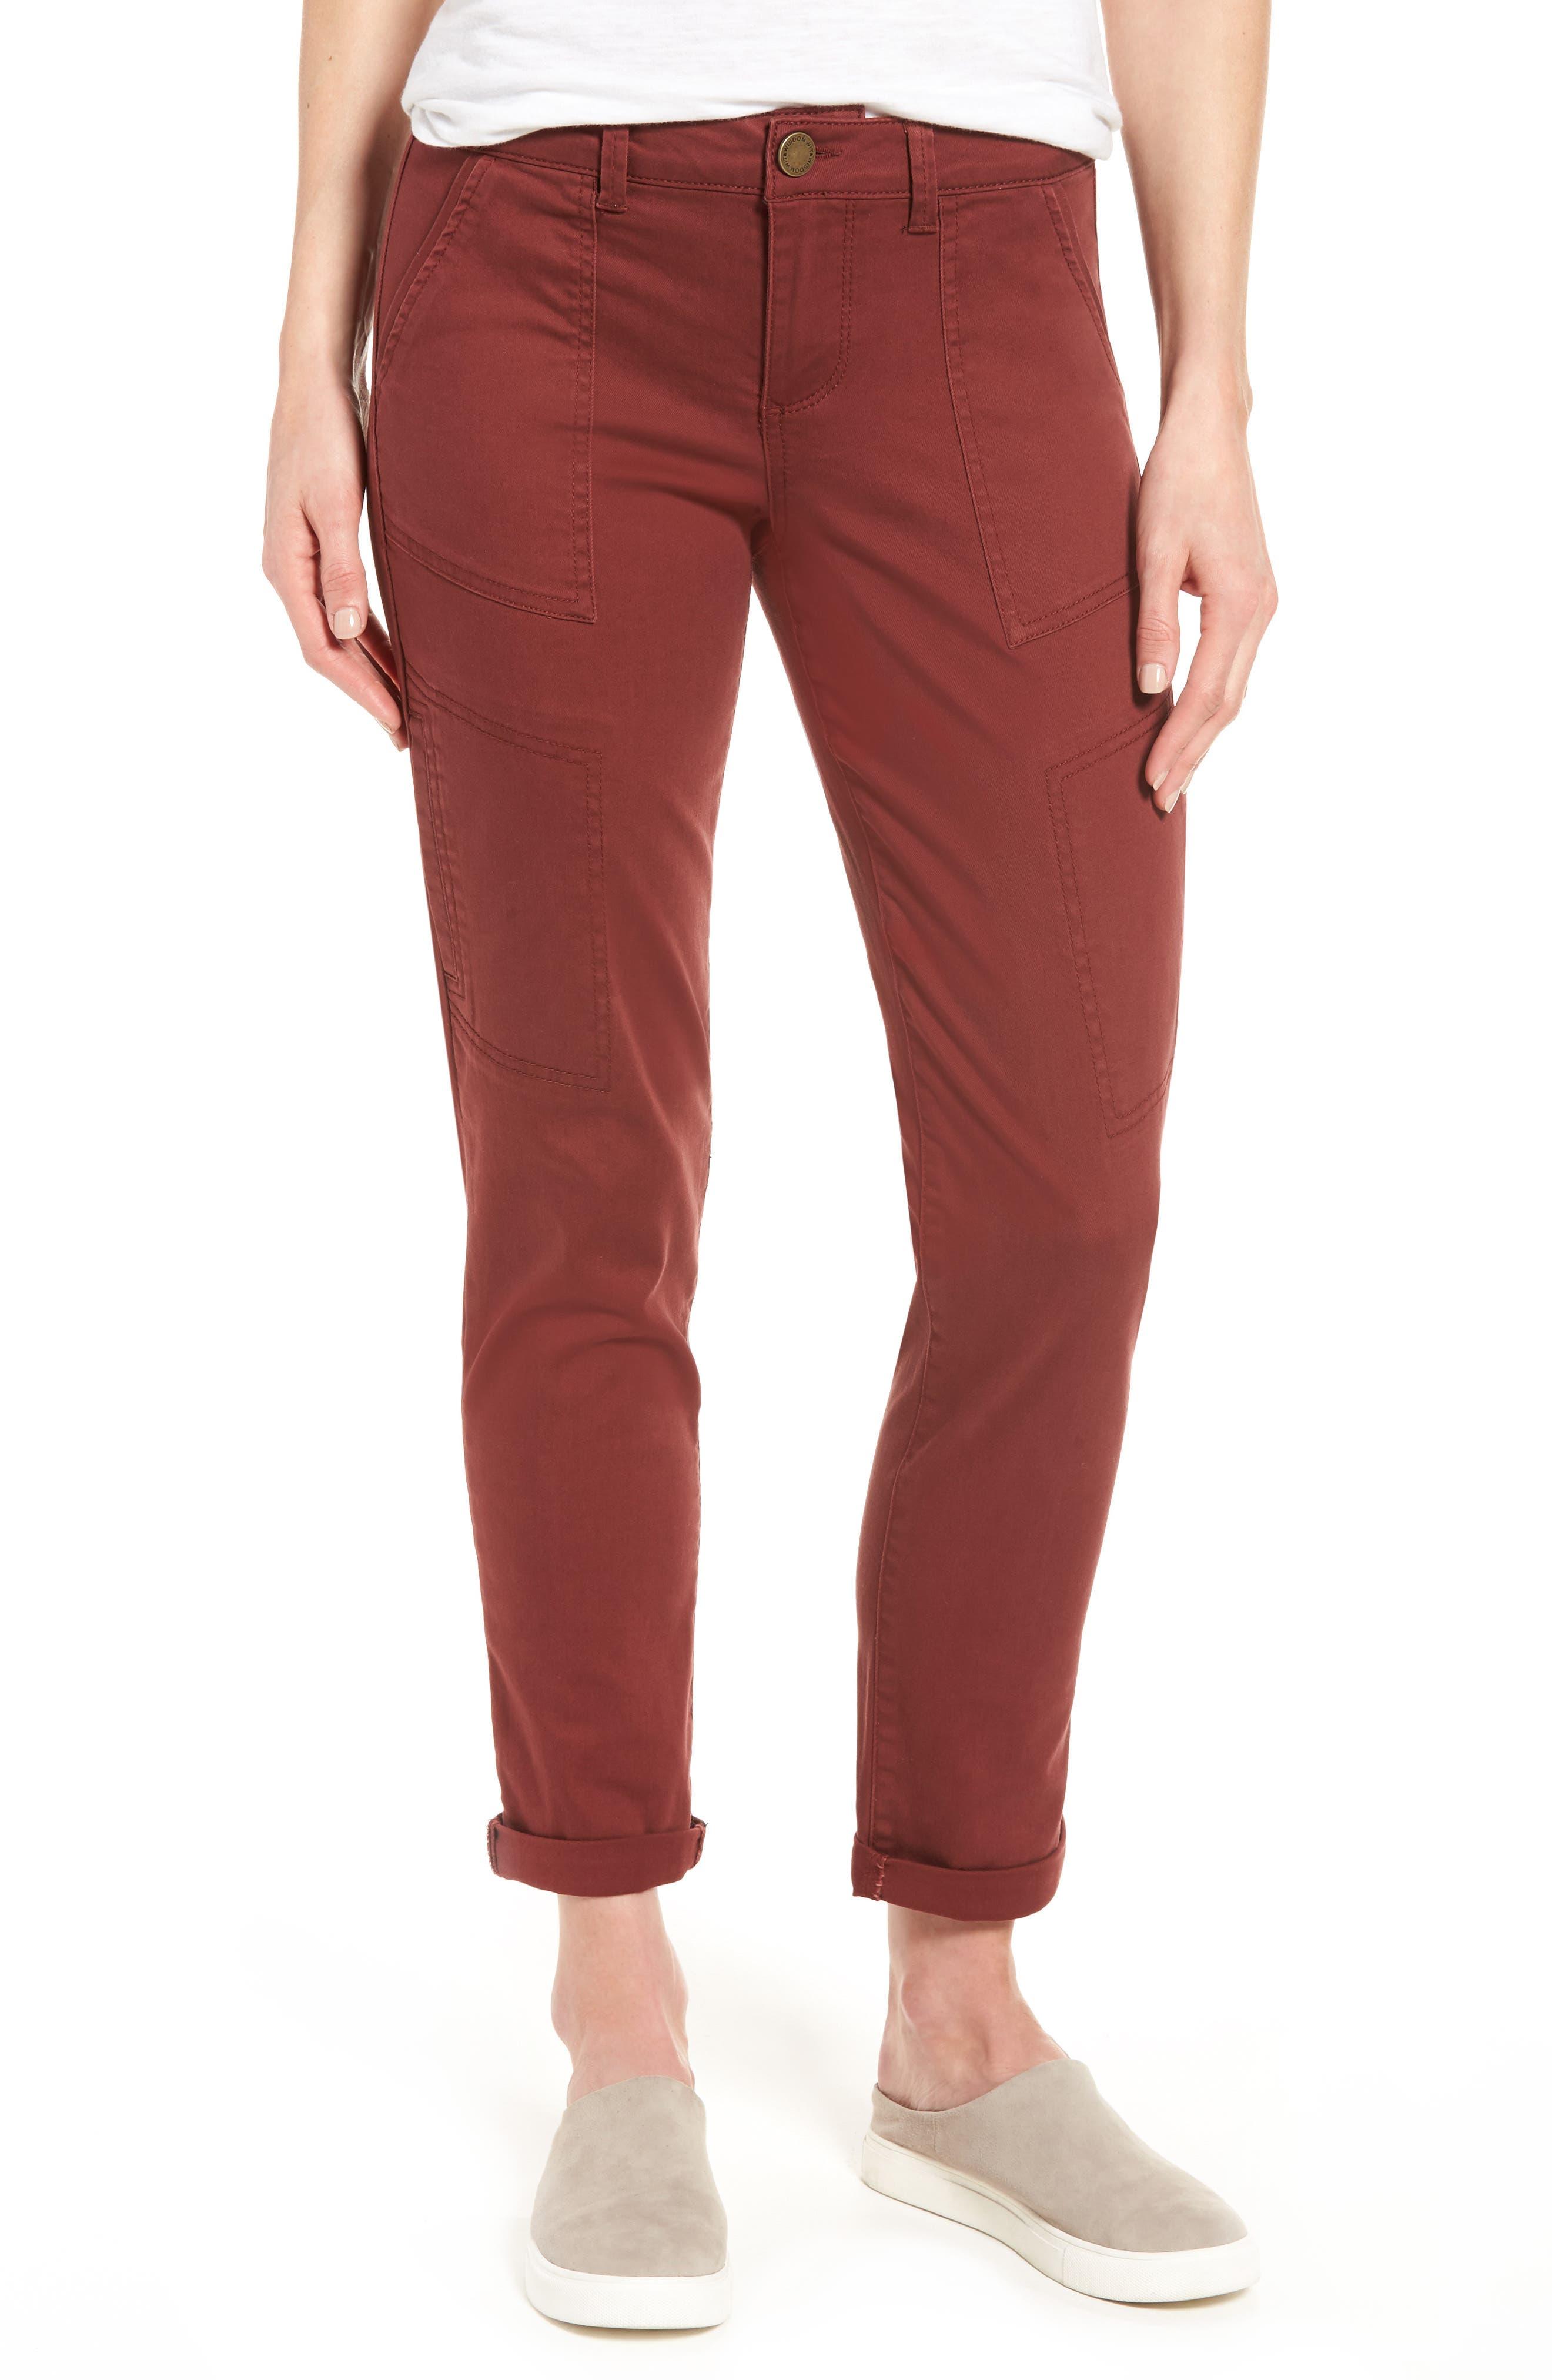 Wit & Wisdom Skinny Cargo Pants (Regular & Petite) (Nordstrom Exclusive)